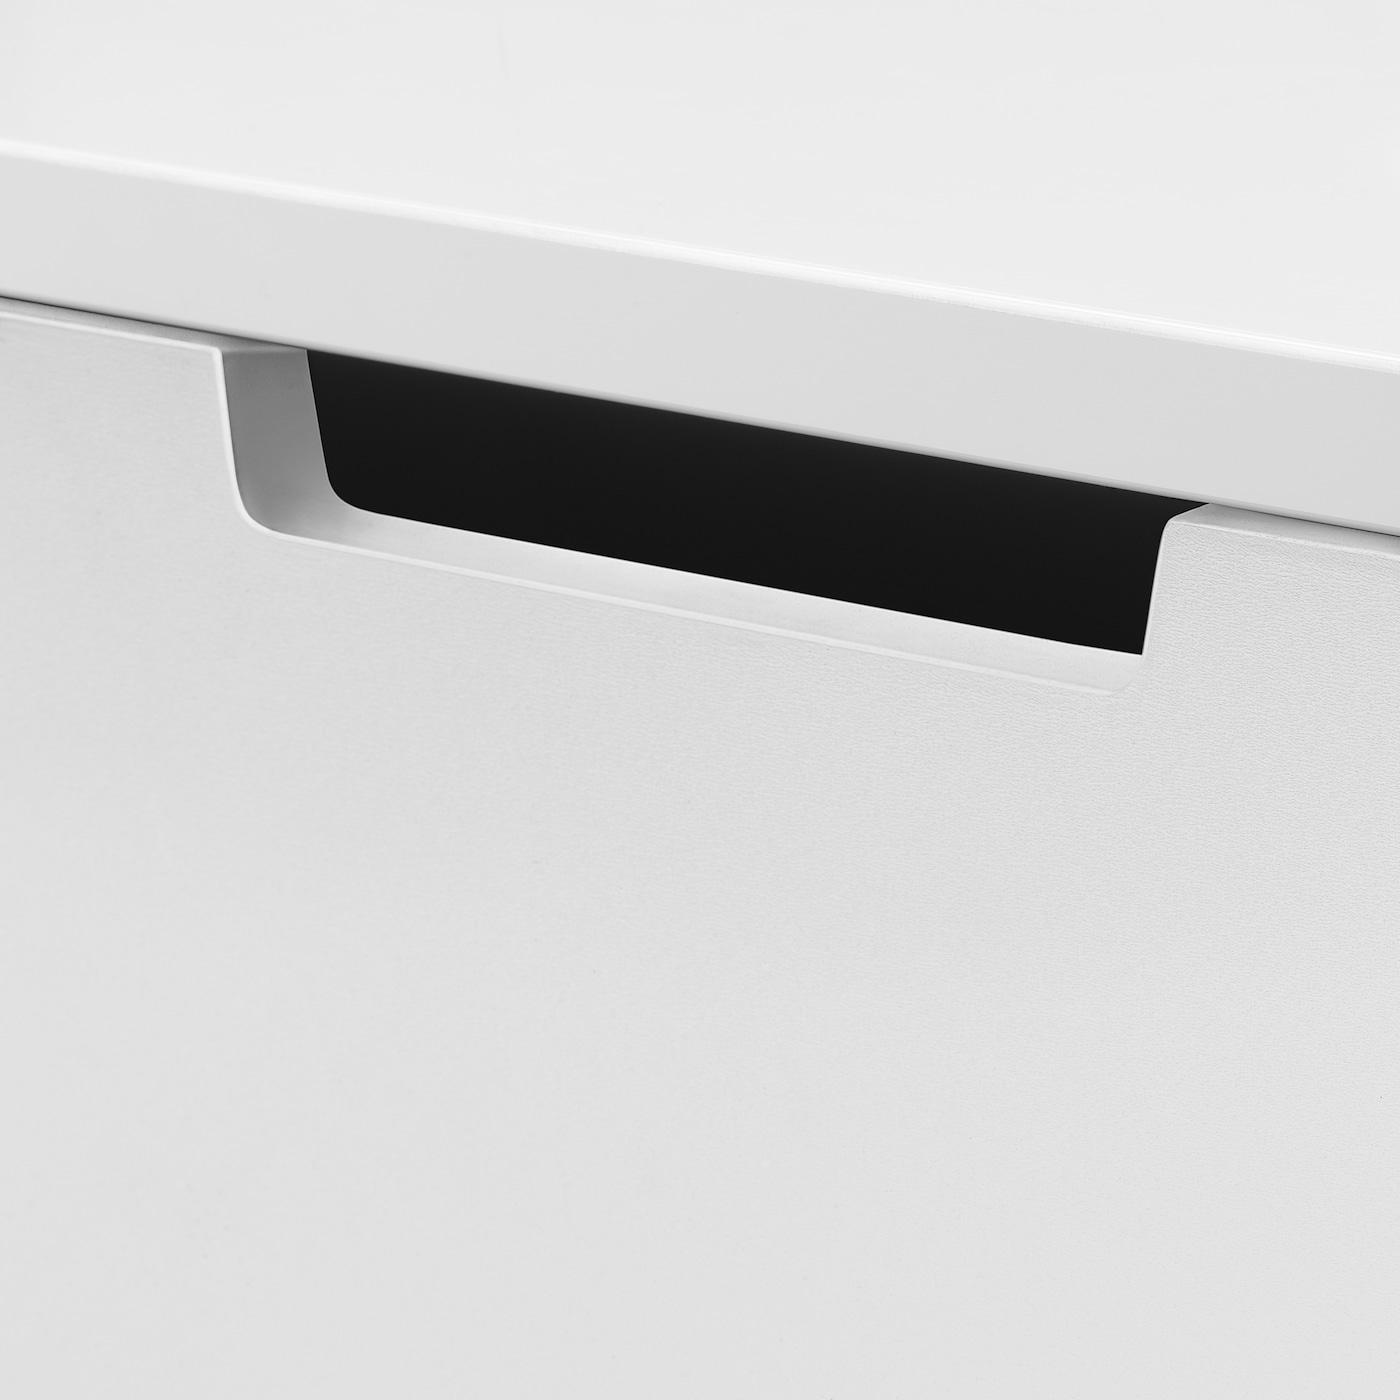 NORDLI Byrå med 4 lådor, vit, 40x99 cm